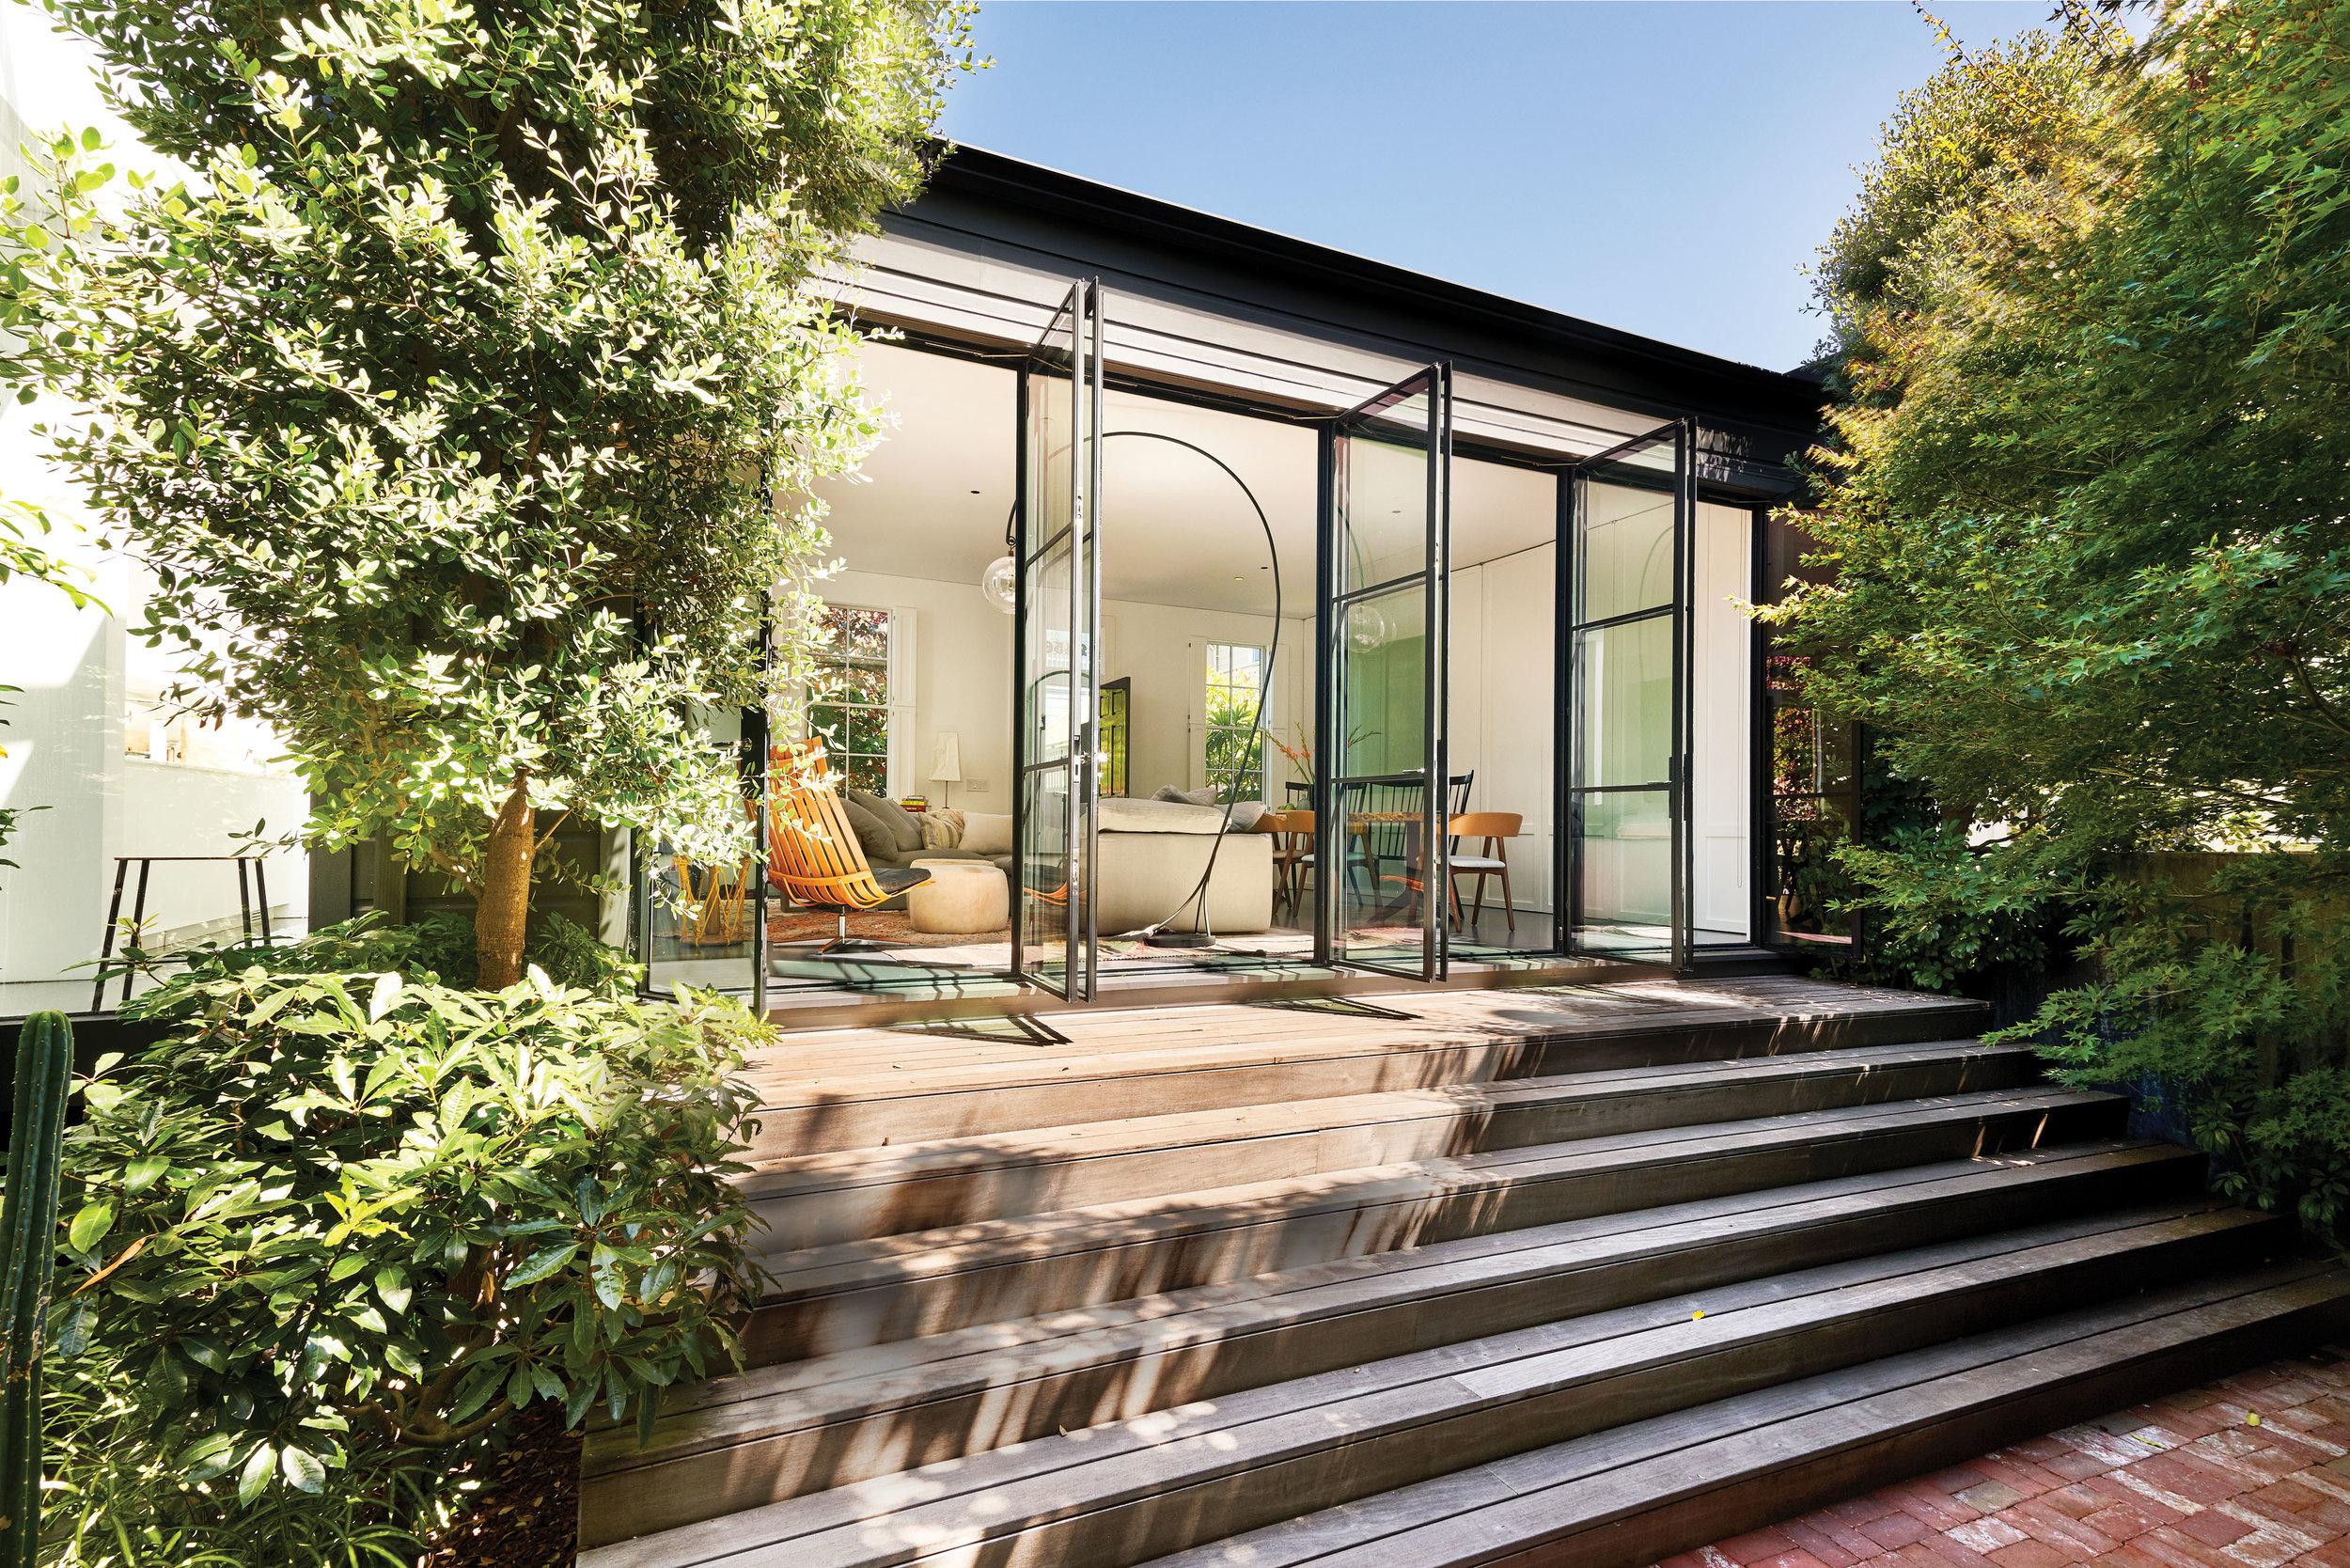 24_Lord_Schriber_Garden_doors_06199_v2.jpg